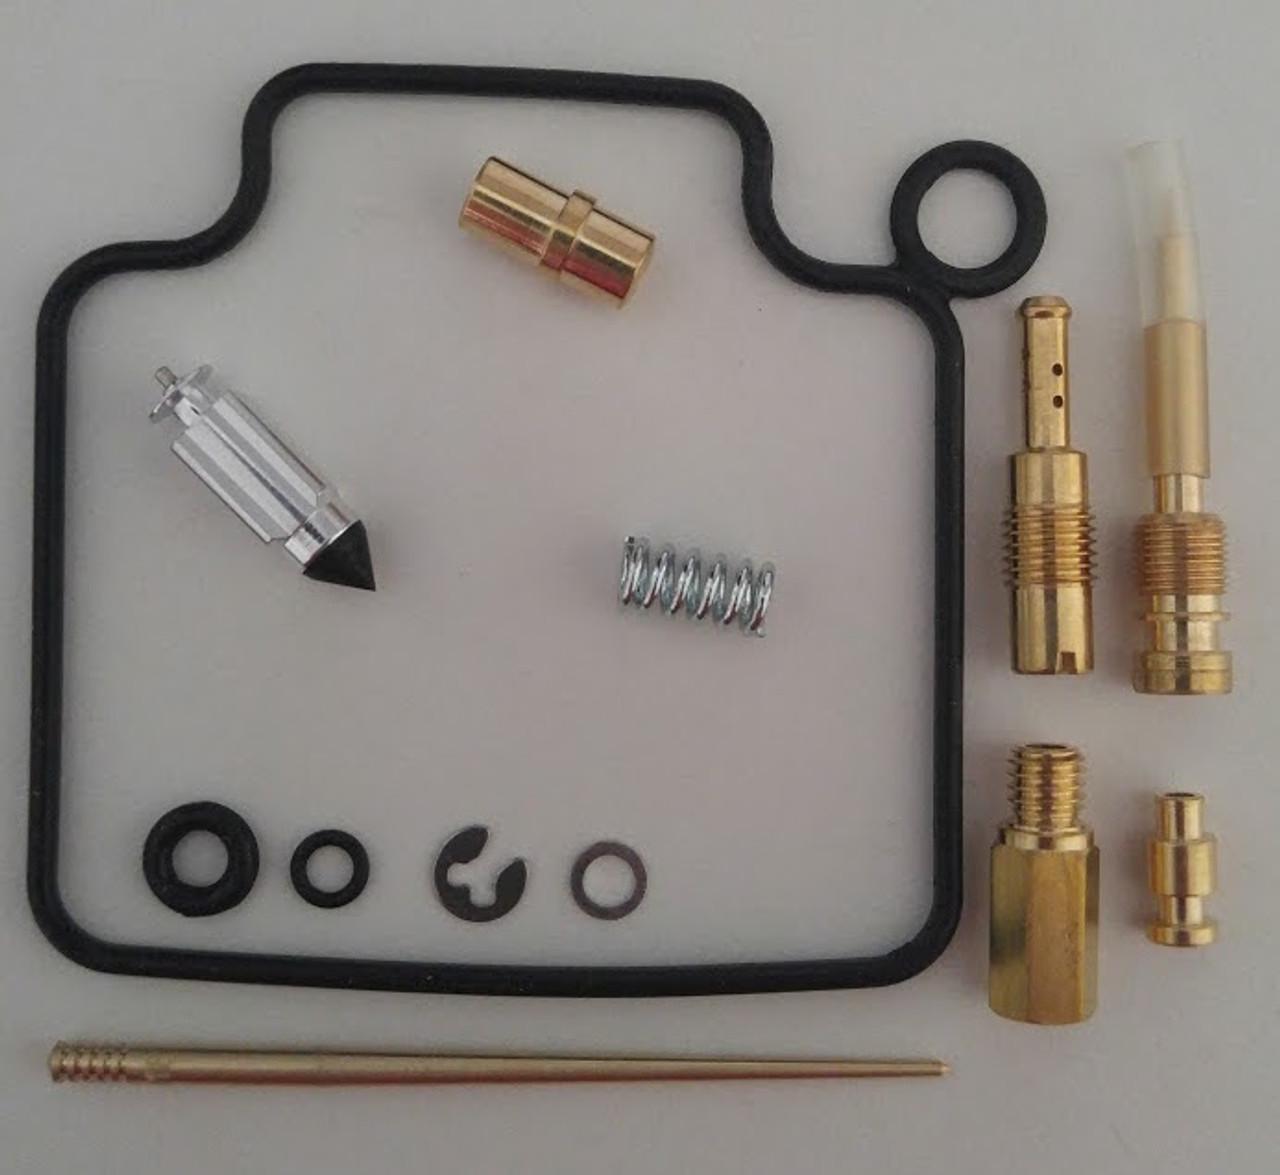 Honda TRX400EX 1999-2004 400EX Carburetor Carb Rebuild Kit Repair TRX 400  EX DC-R28